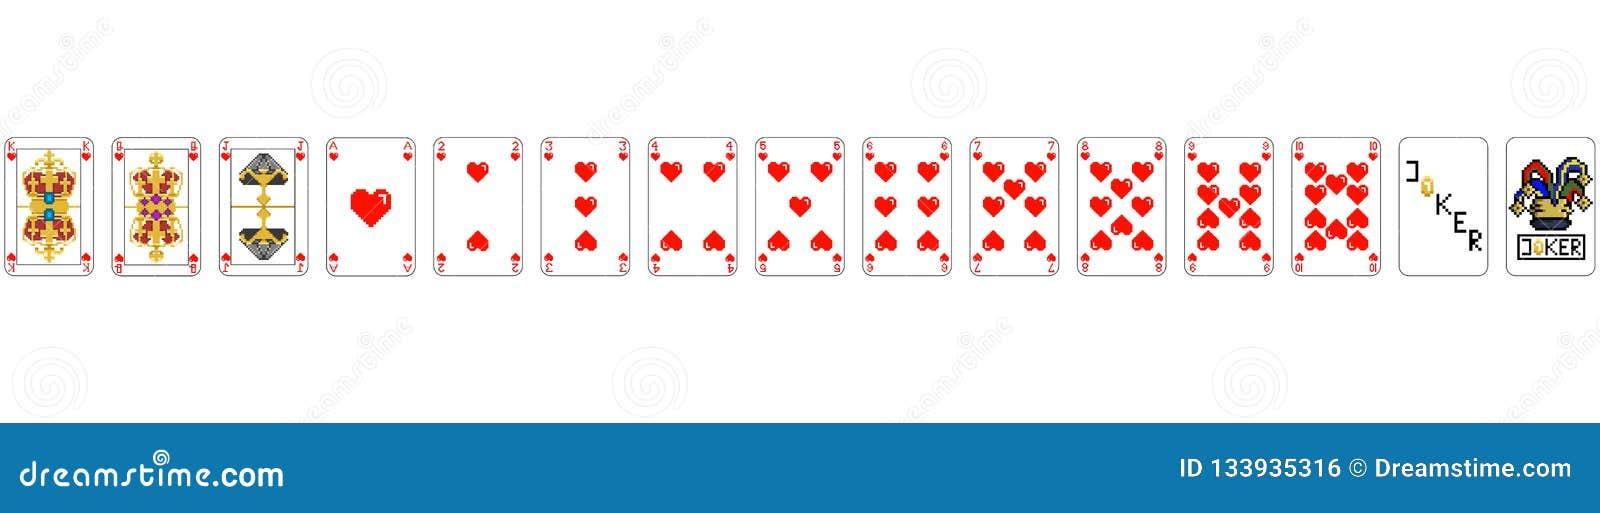 Playing Cards - Pixel Heart PIXEL ART